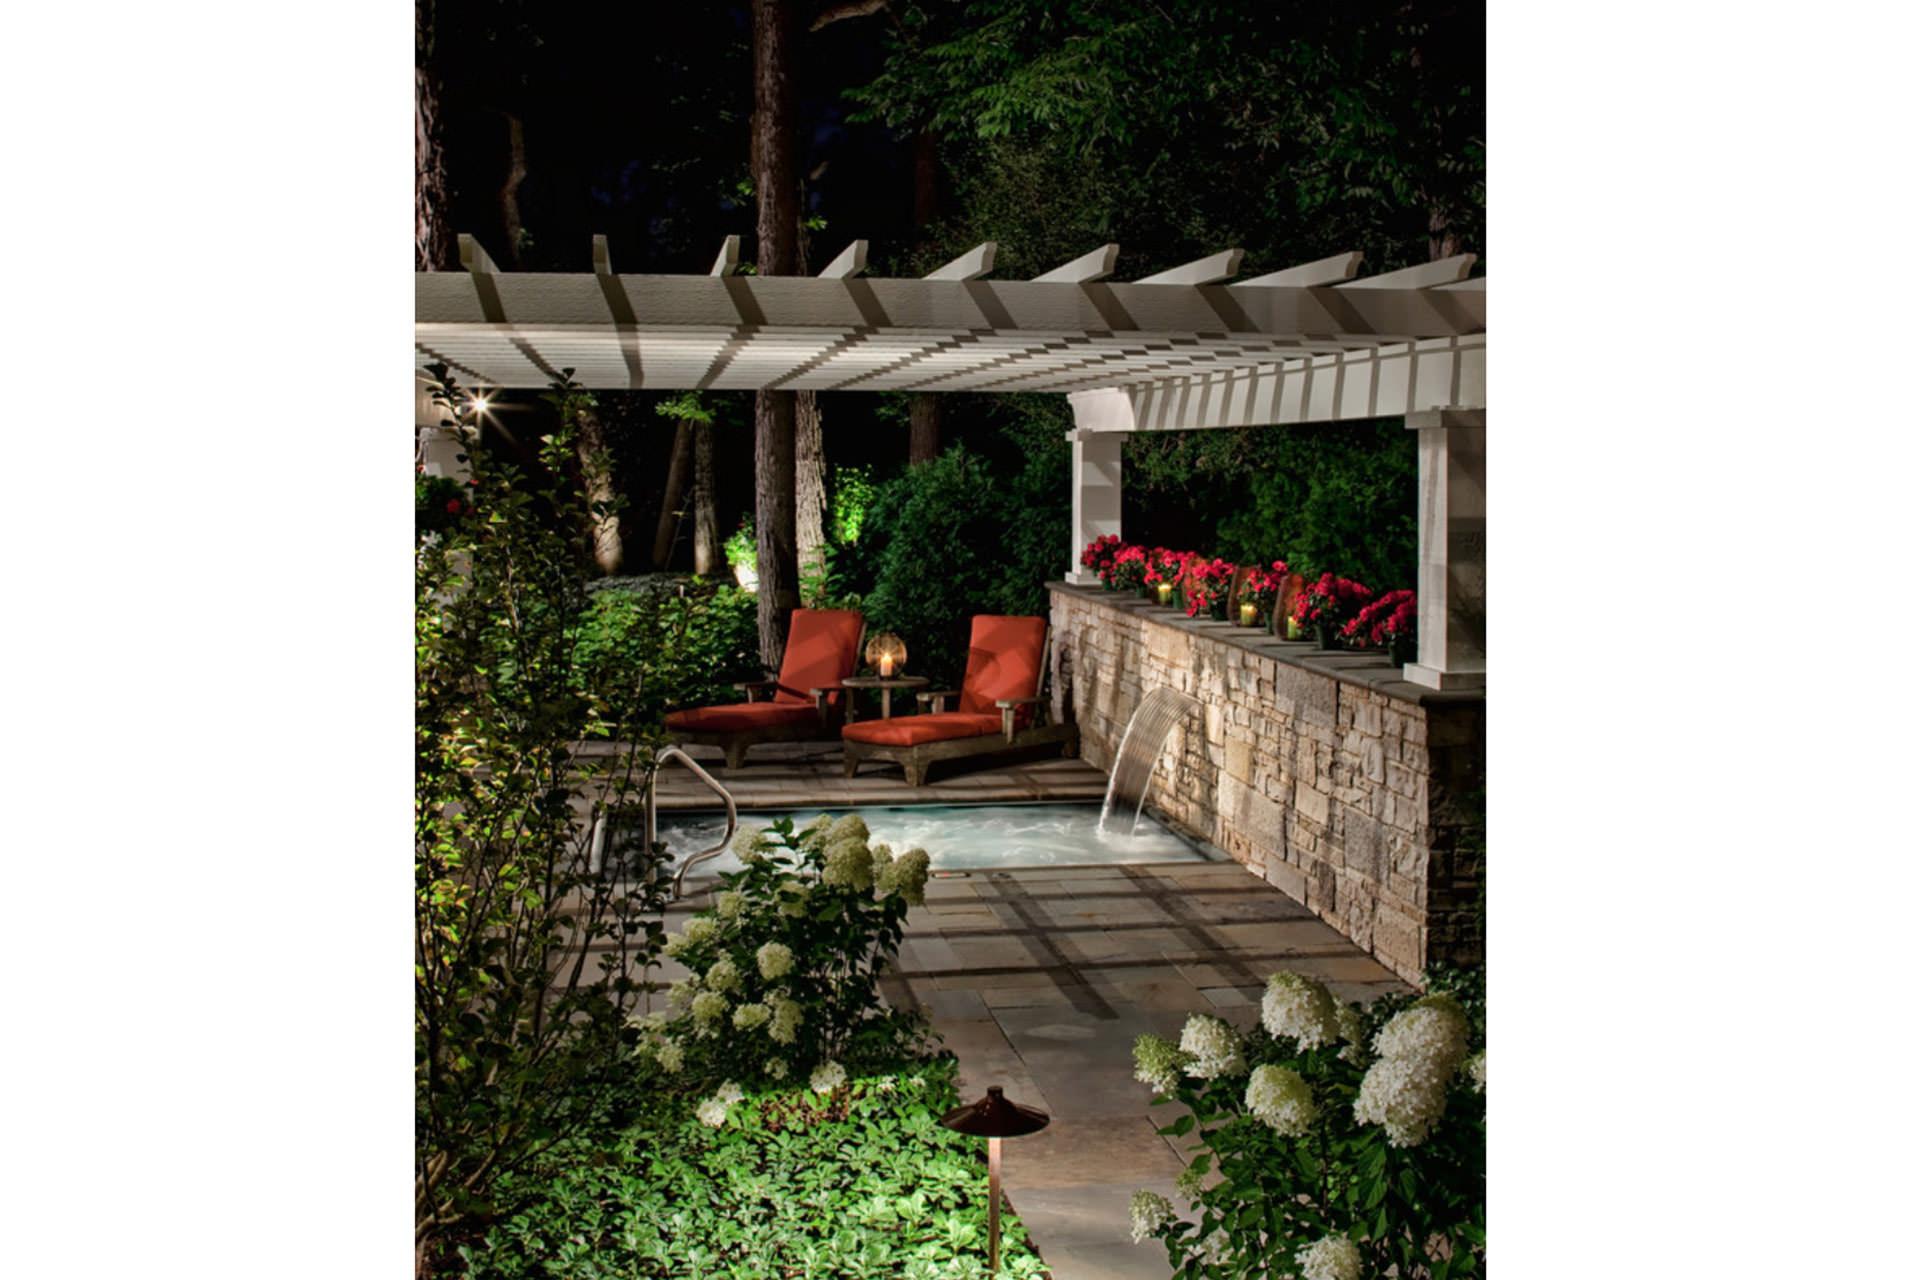 Hursthouse Landscape Architects